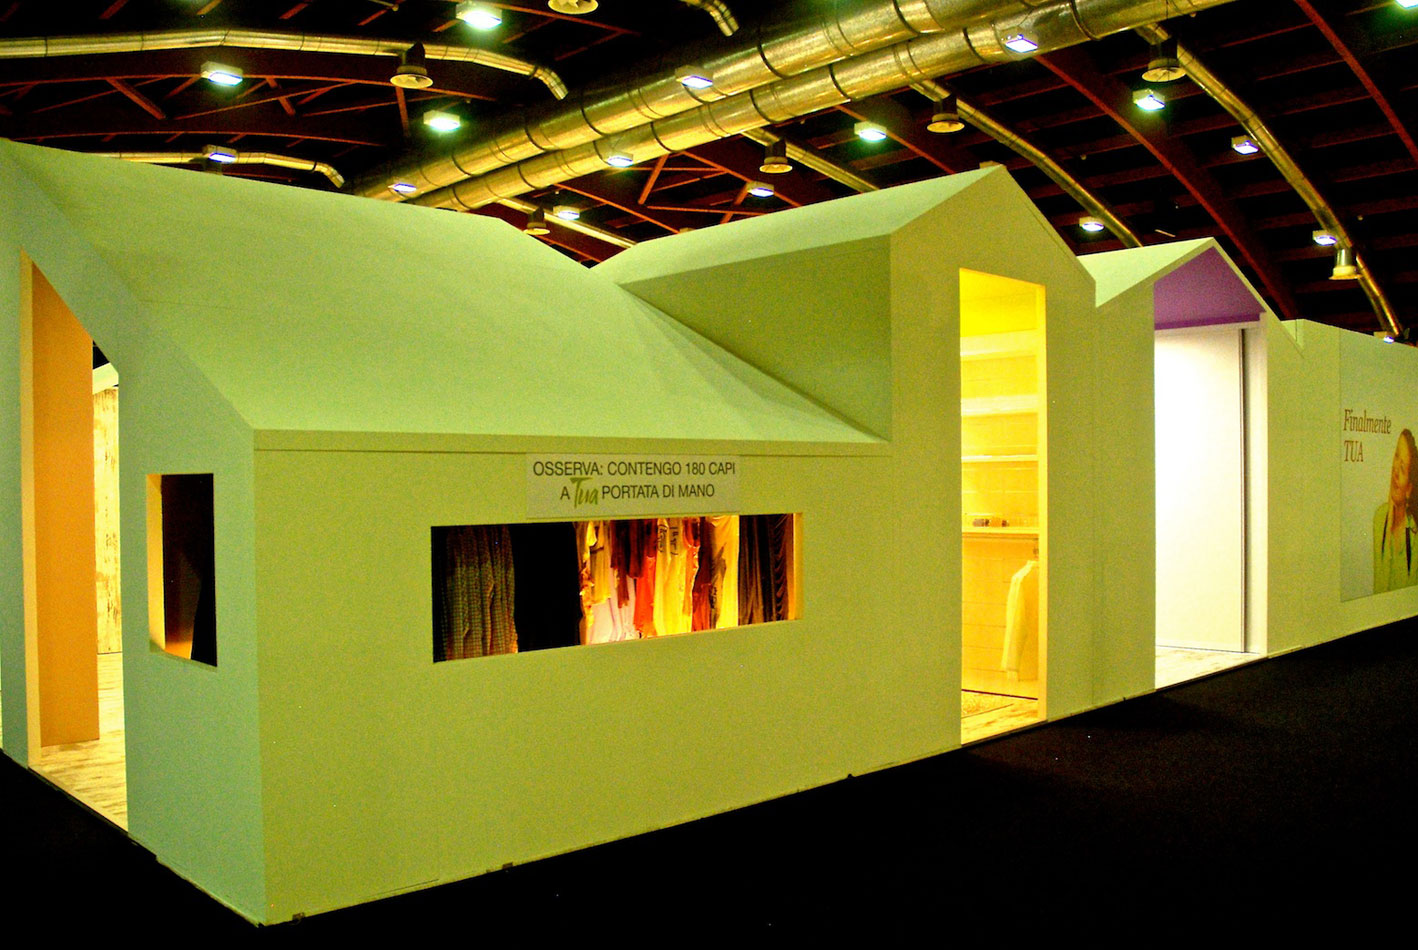 Tua la cabina armadio su misura for Casa moderna udine